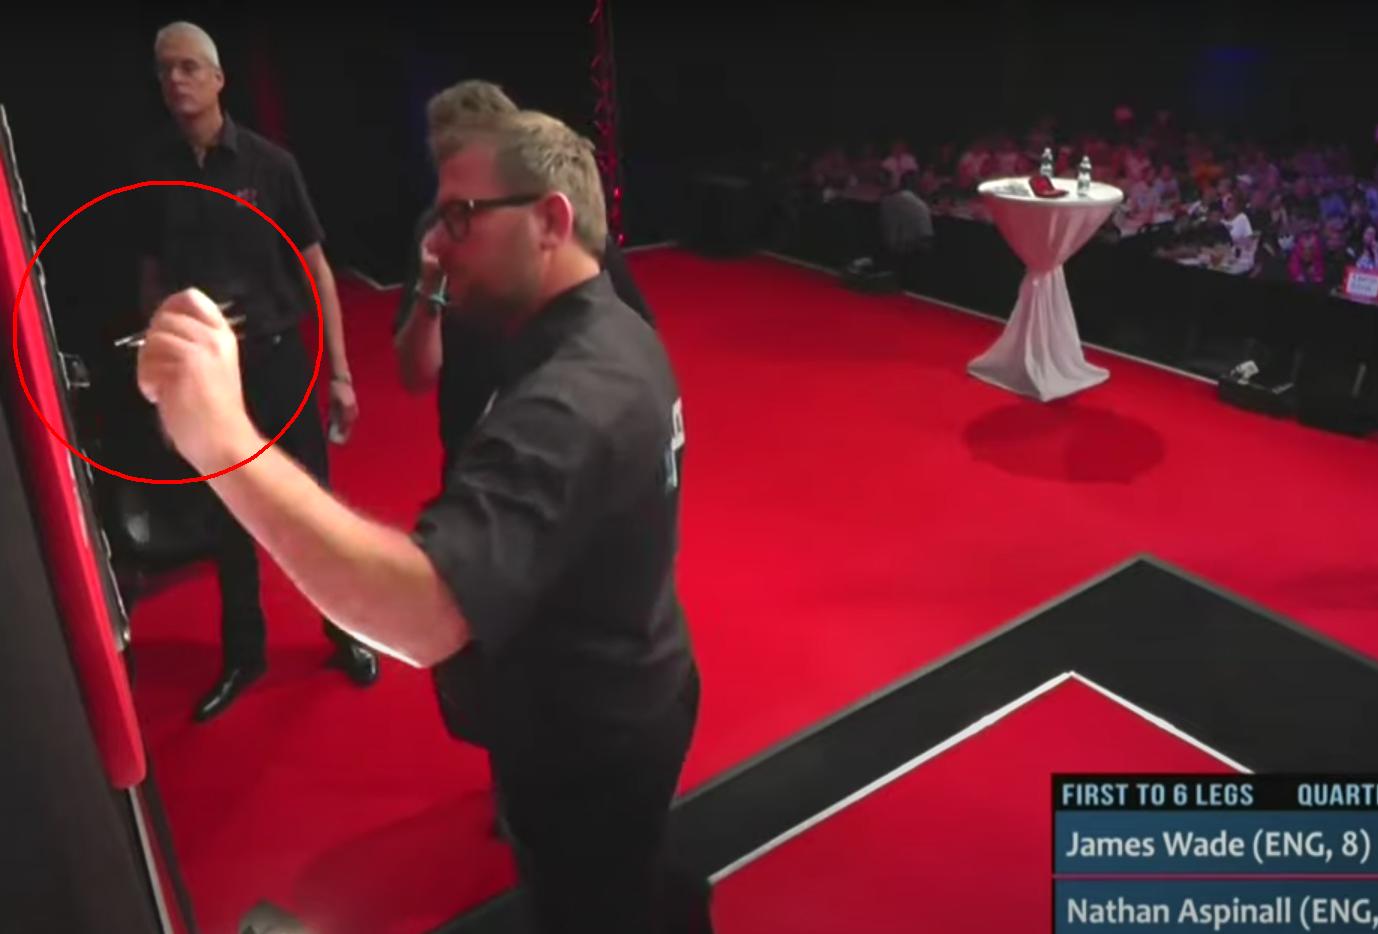 VIDEO: Pointing Incident James Wade At Gibraltar Darts Trophy 2021